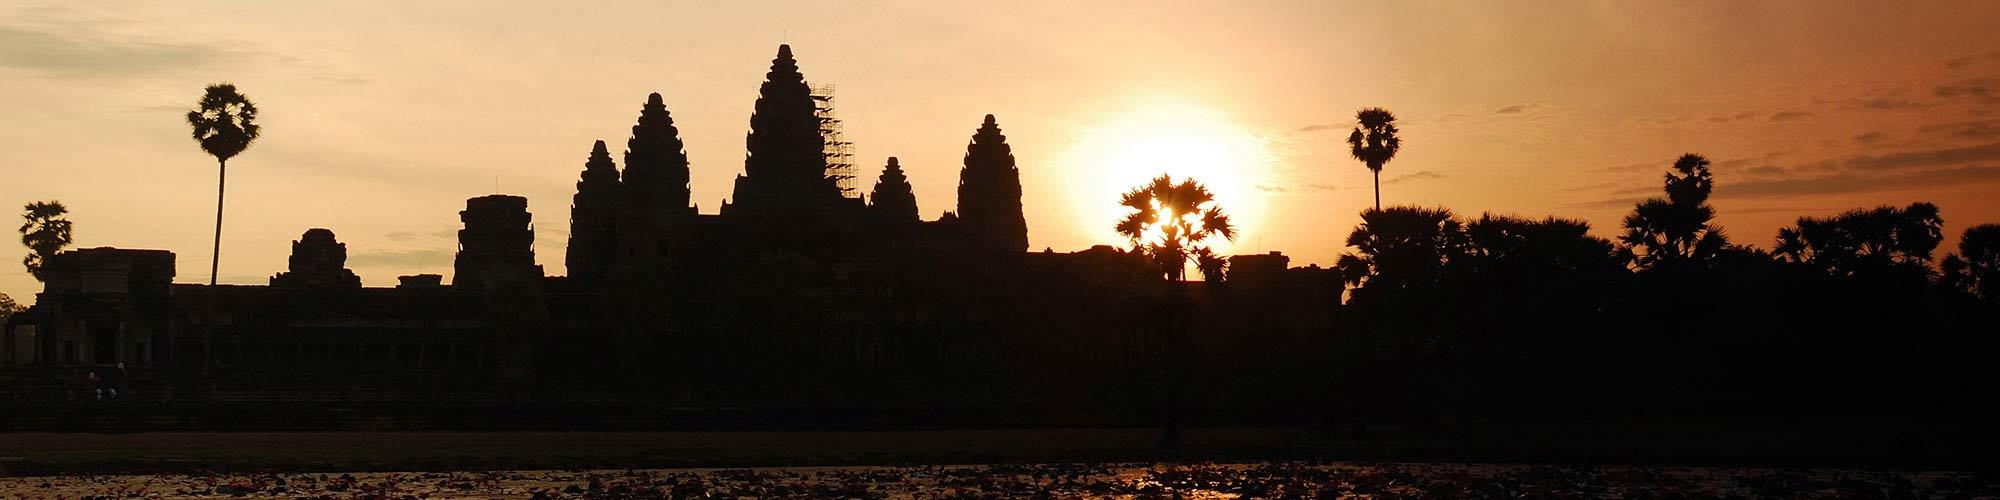 cambodia-banner-3.jpg